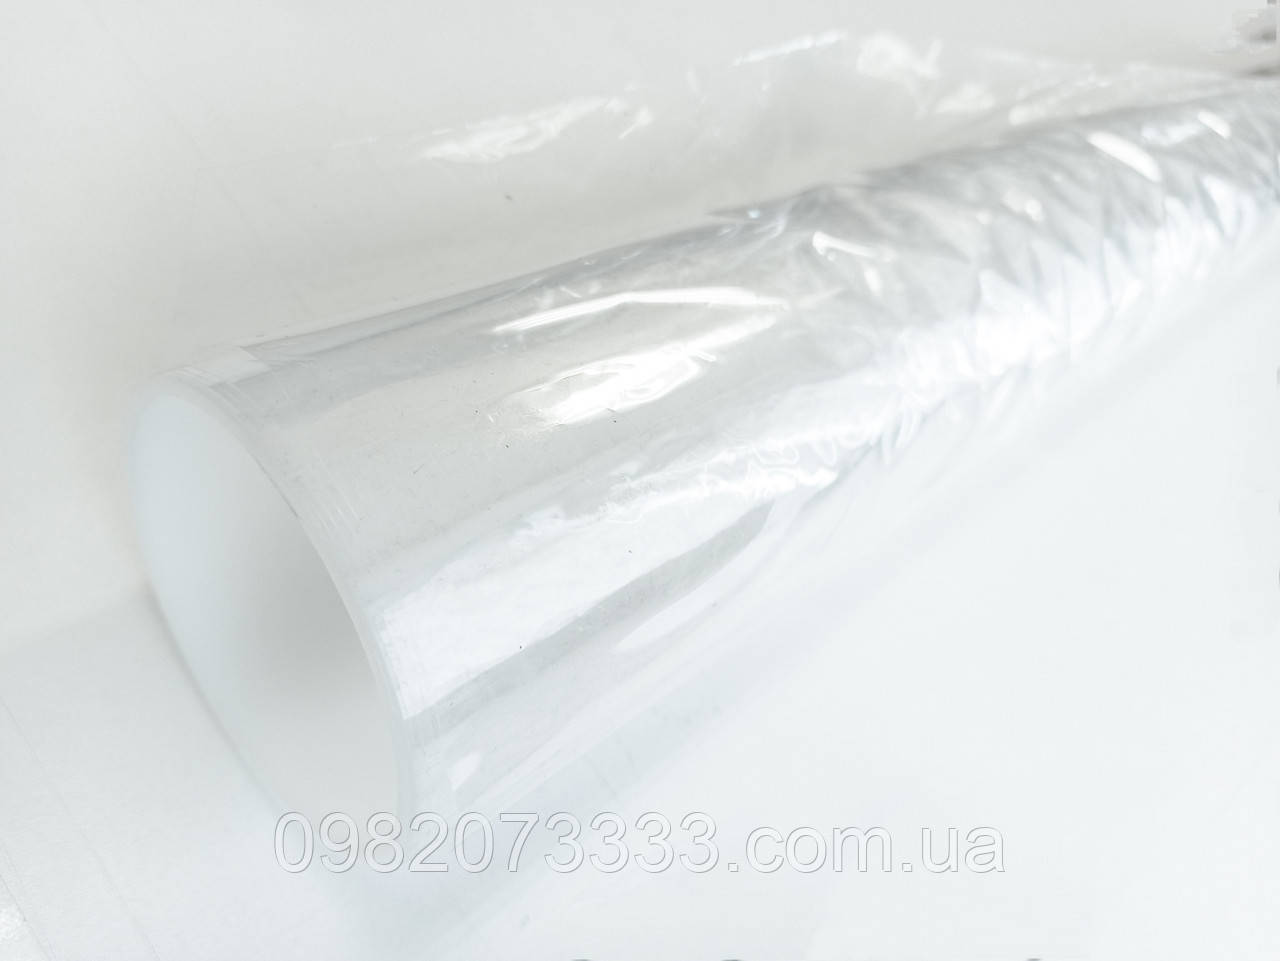 Пленка парниковая тепличная 50мкм (ширина 0,3м, длина 30м, можно отрез)